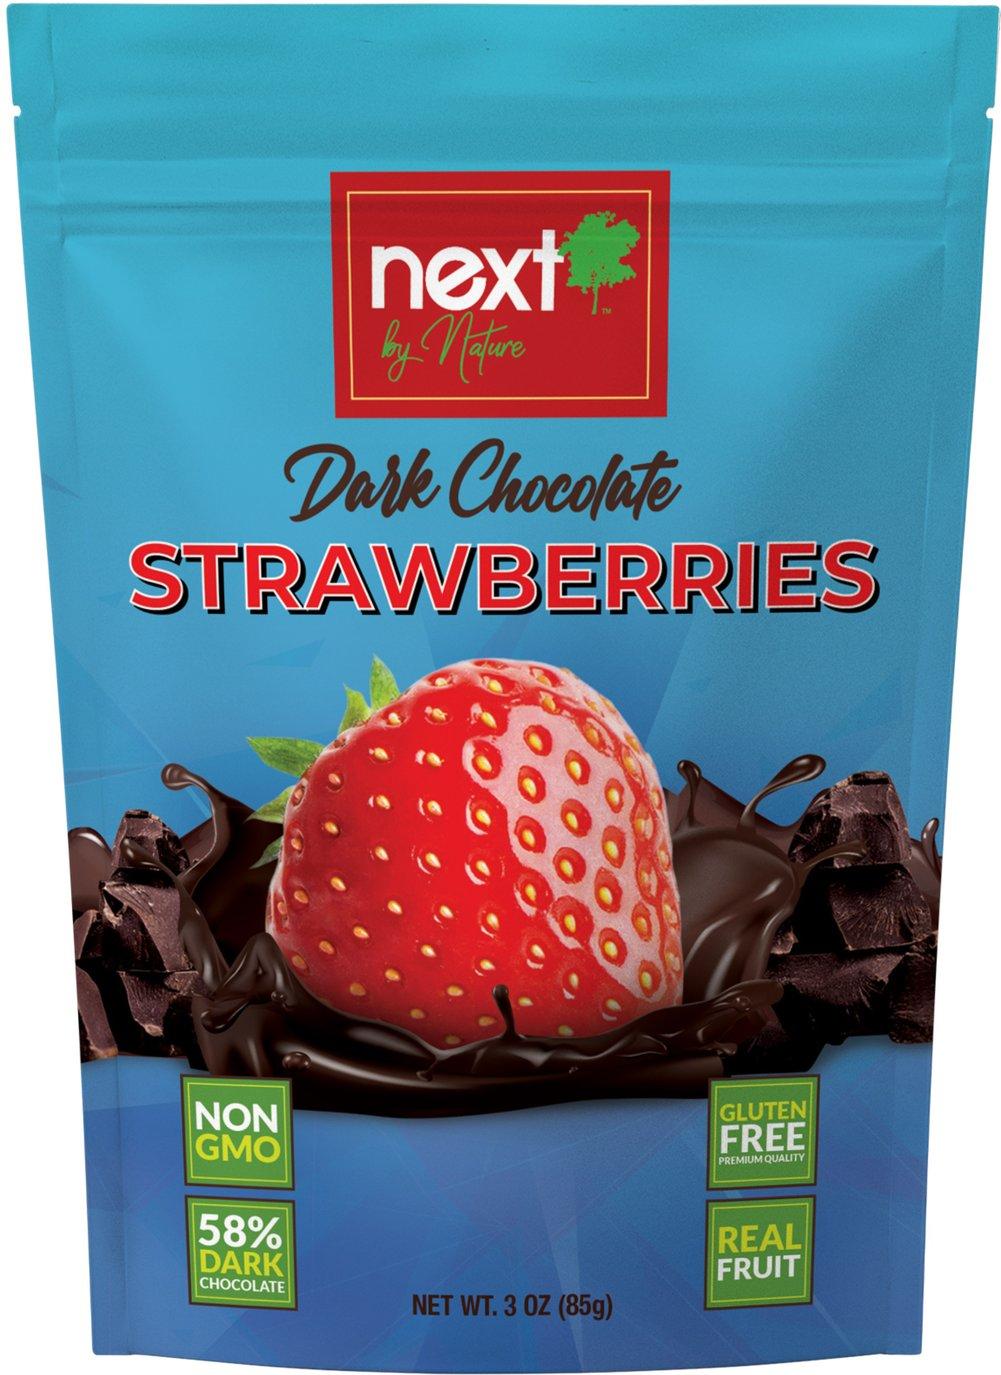 Dark Chocolate Strawberries  3 oz Bag  $5.99